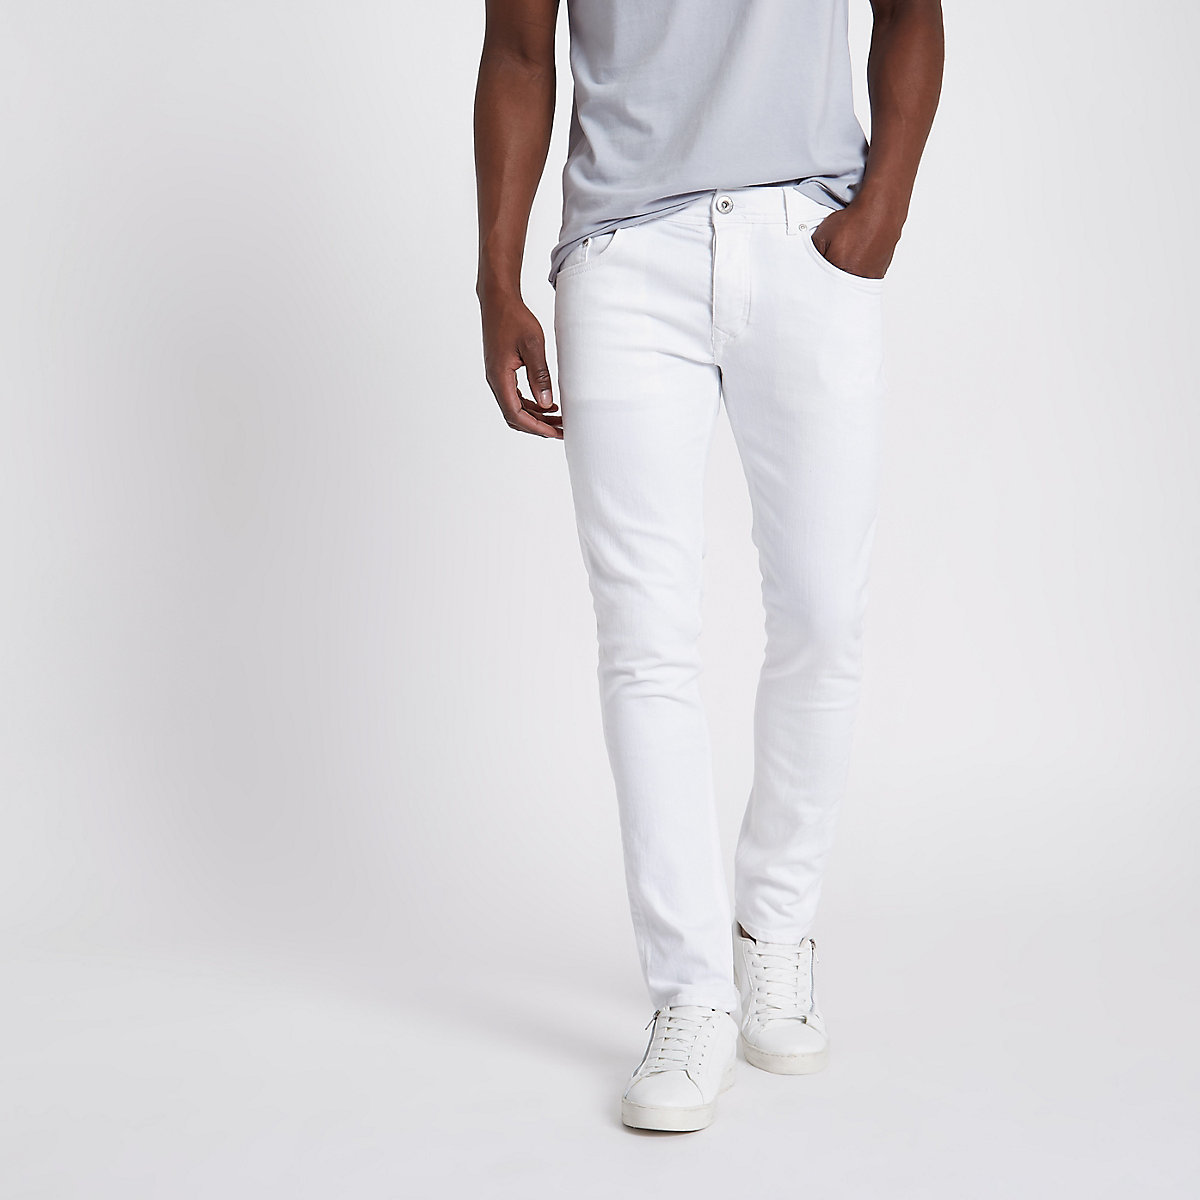 White Eddy skinny fit jeans